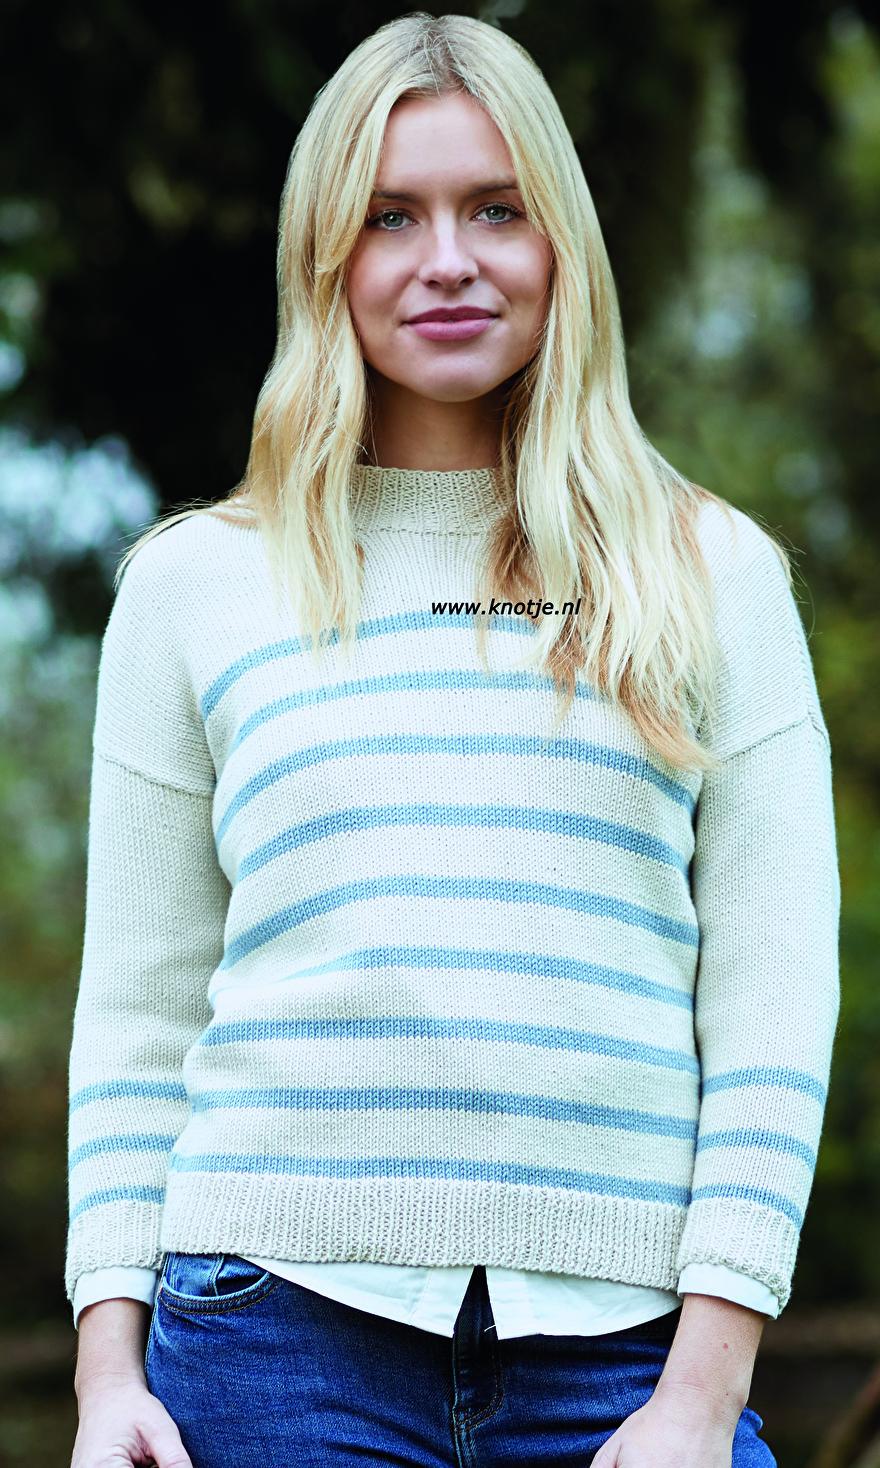 StripedSweater_18-11-15_Quail_0361kopie.jpg